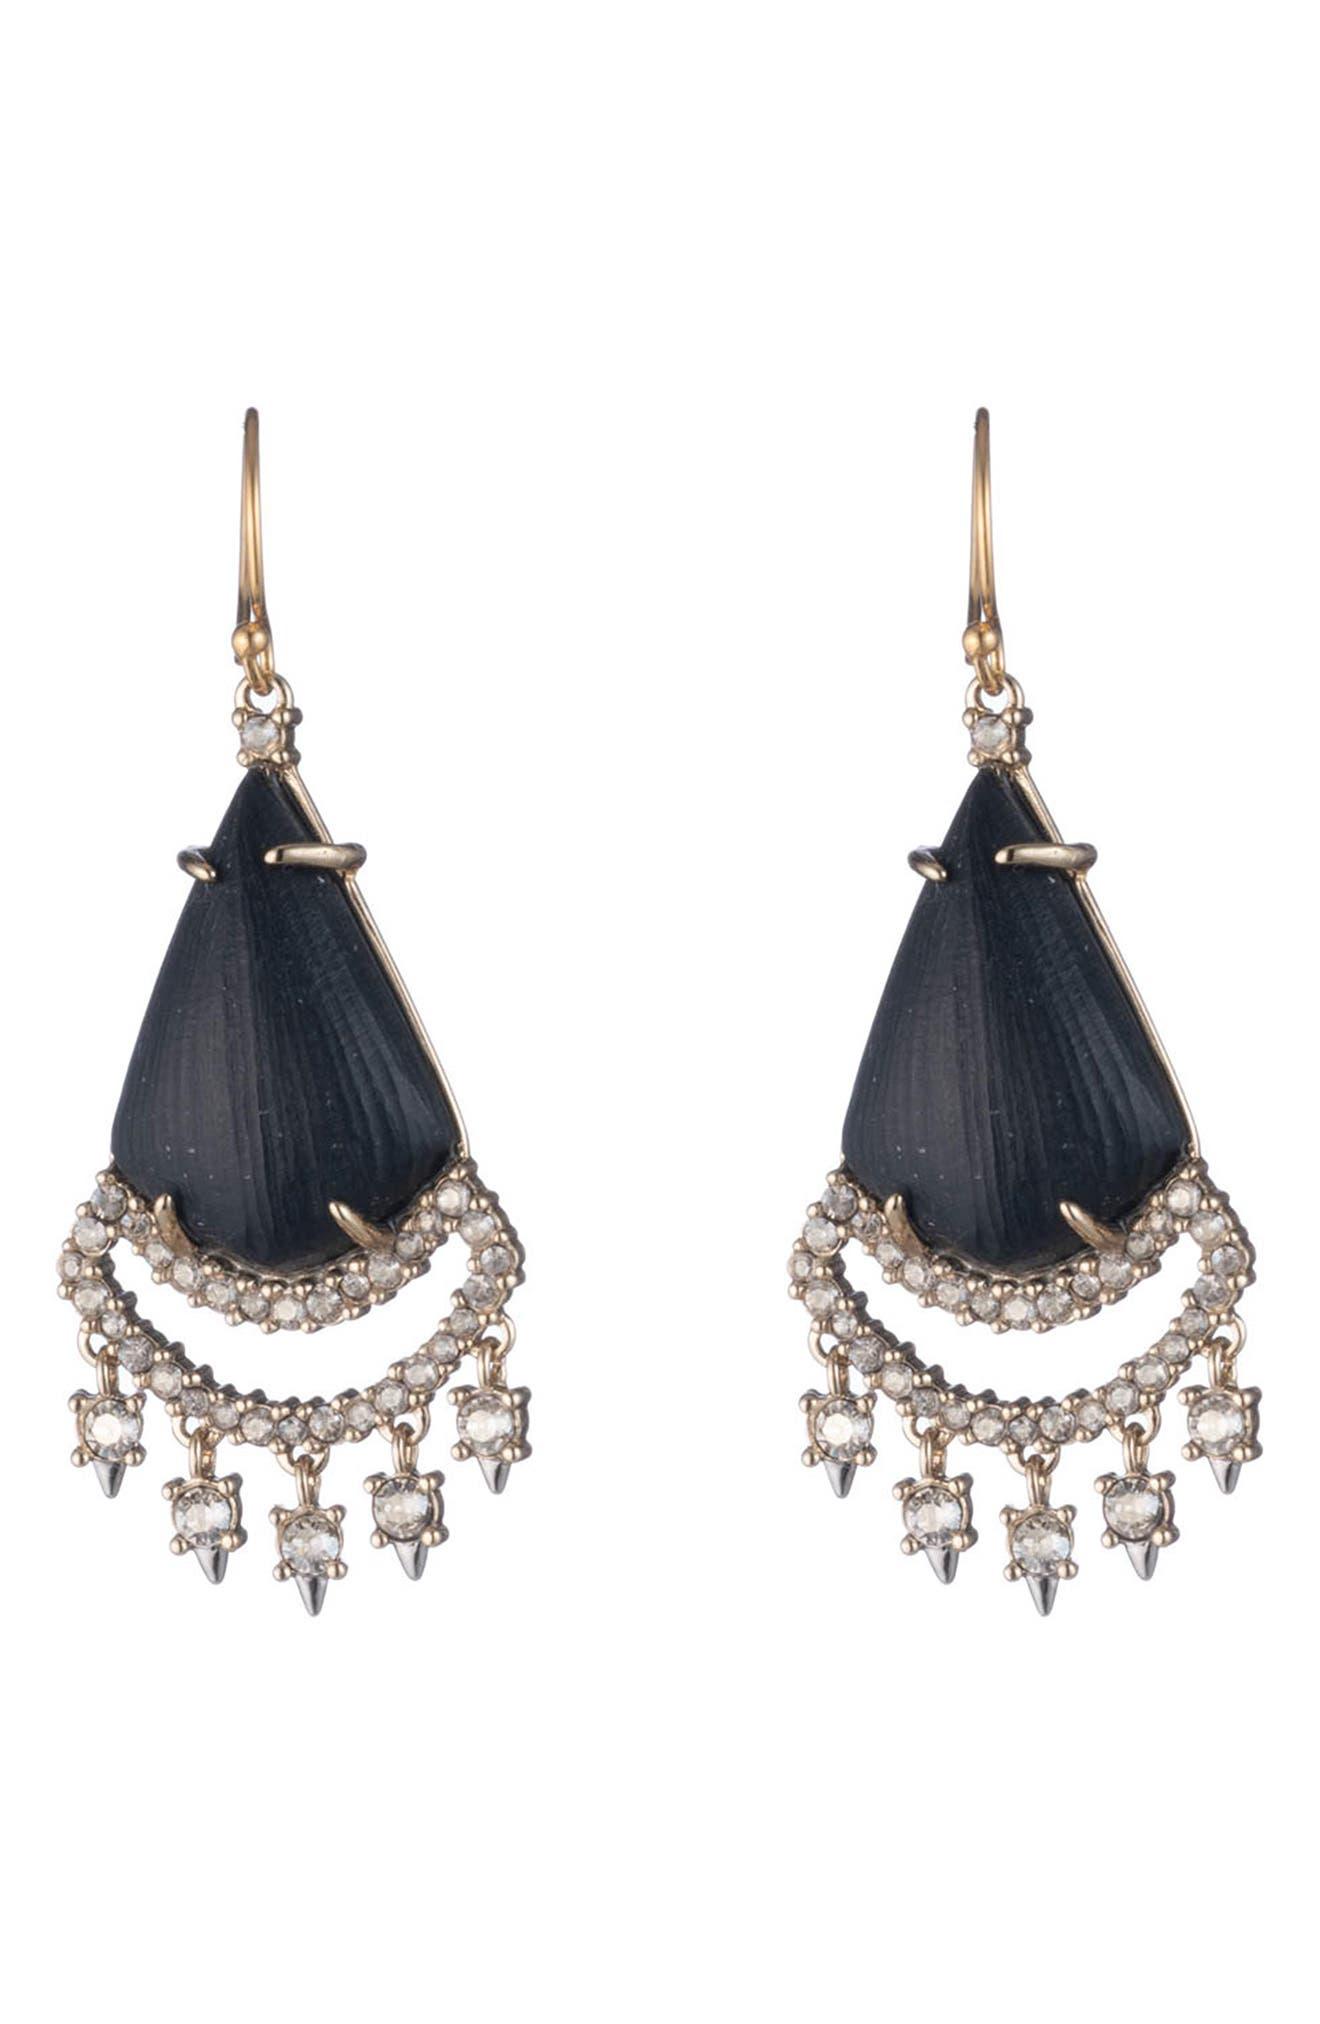 Image of Alexis Bittar Crystal Lace Chandelier Drop Earrings